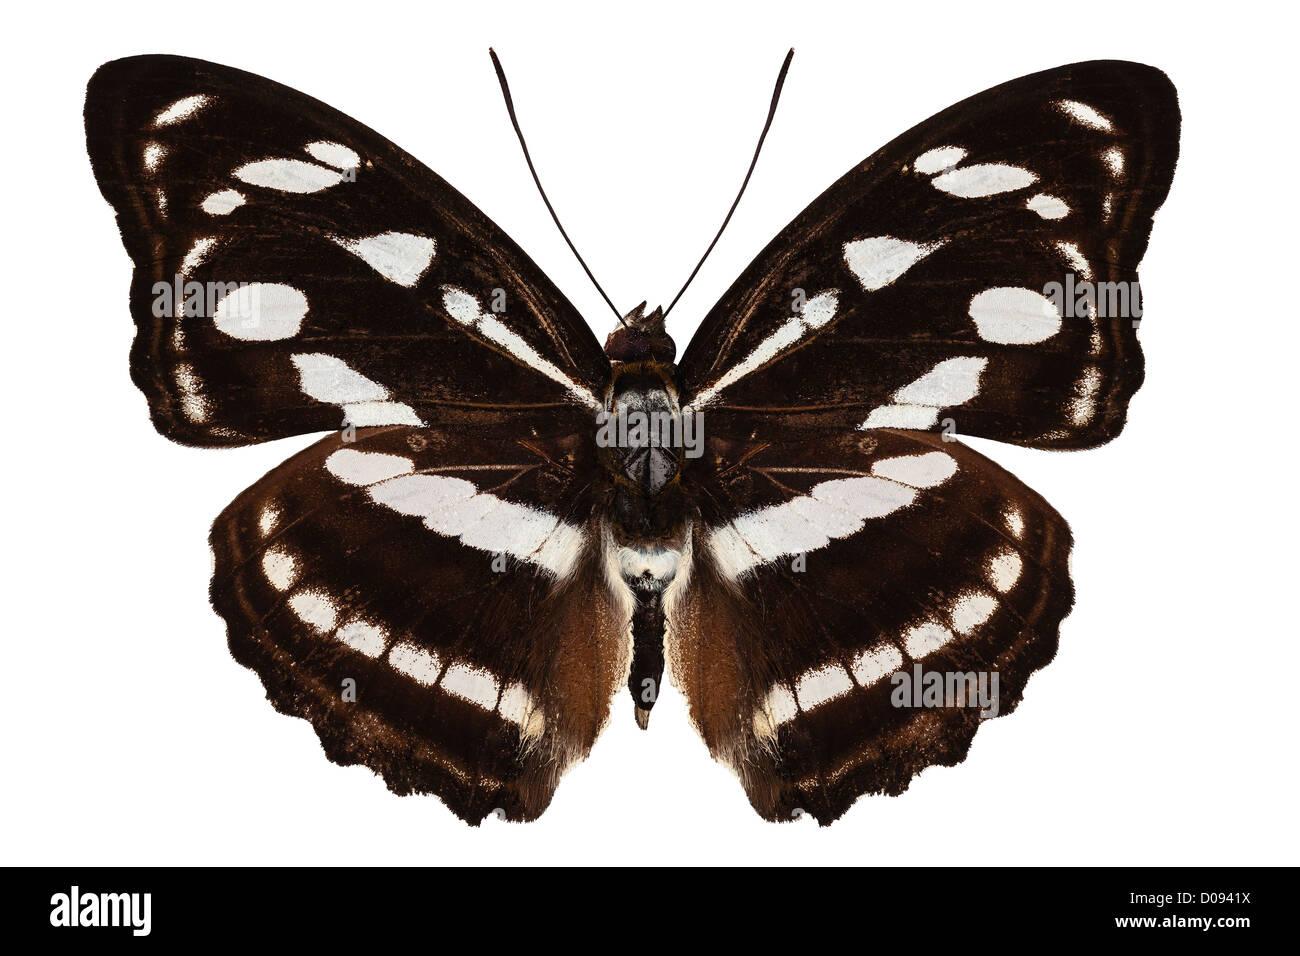 butterfly species Athyma reta moorei - Stock Image